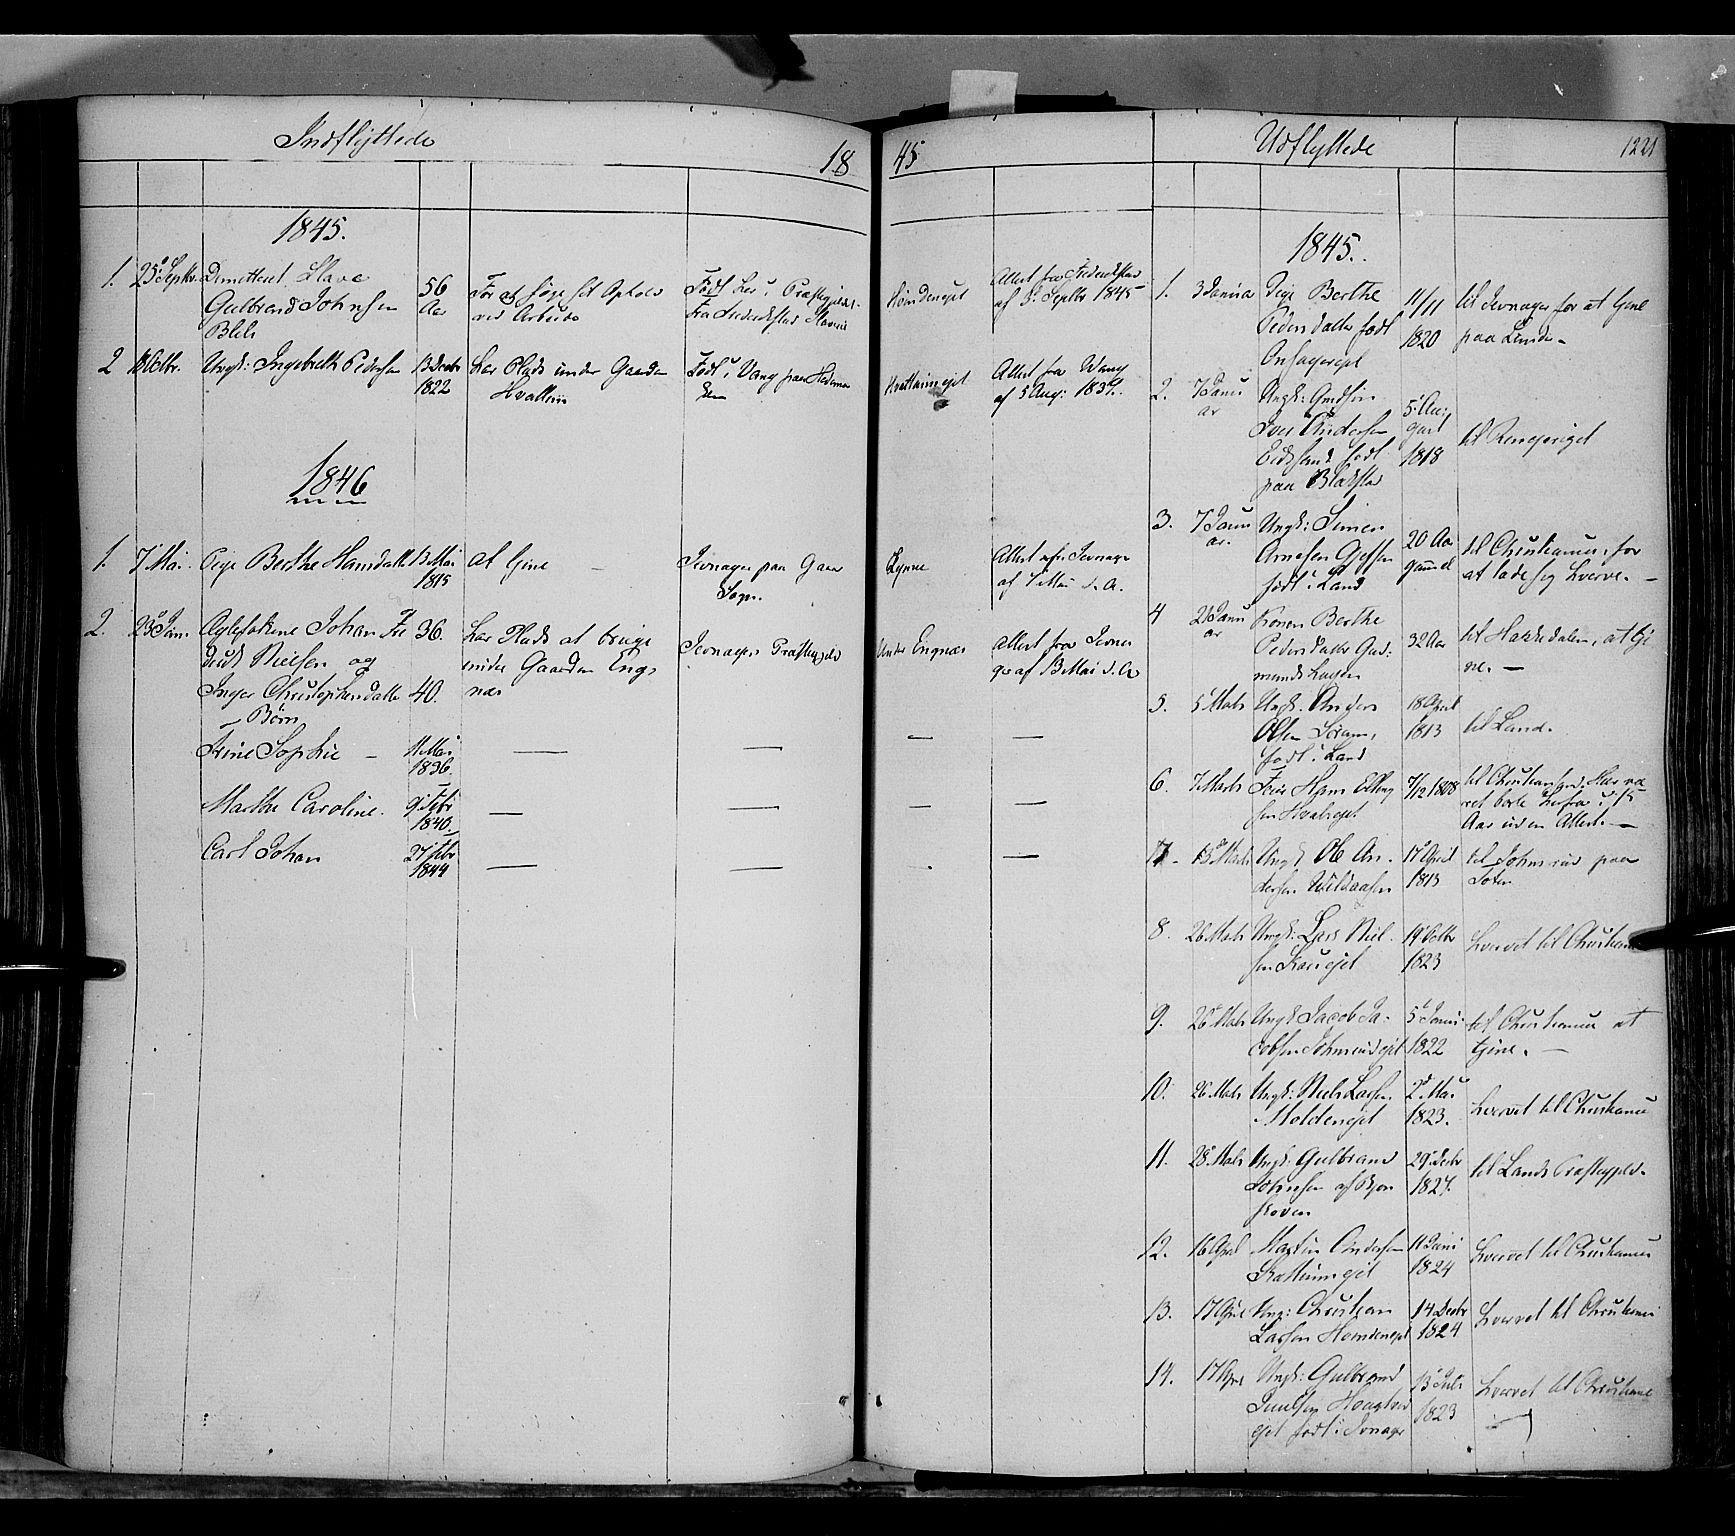 SAH, Gran prestekontor, Ministerialbok nr. 11, 1842-1856, s. 1220-1221